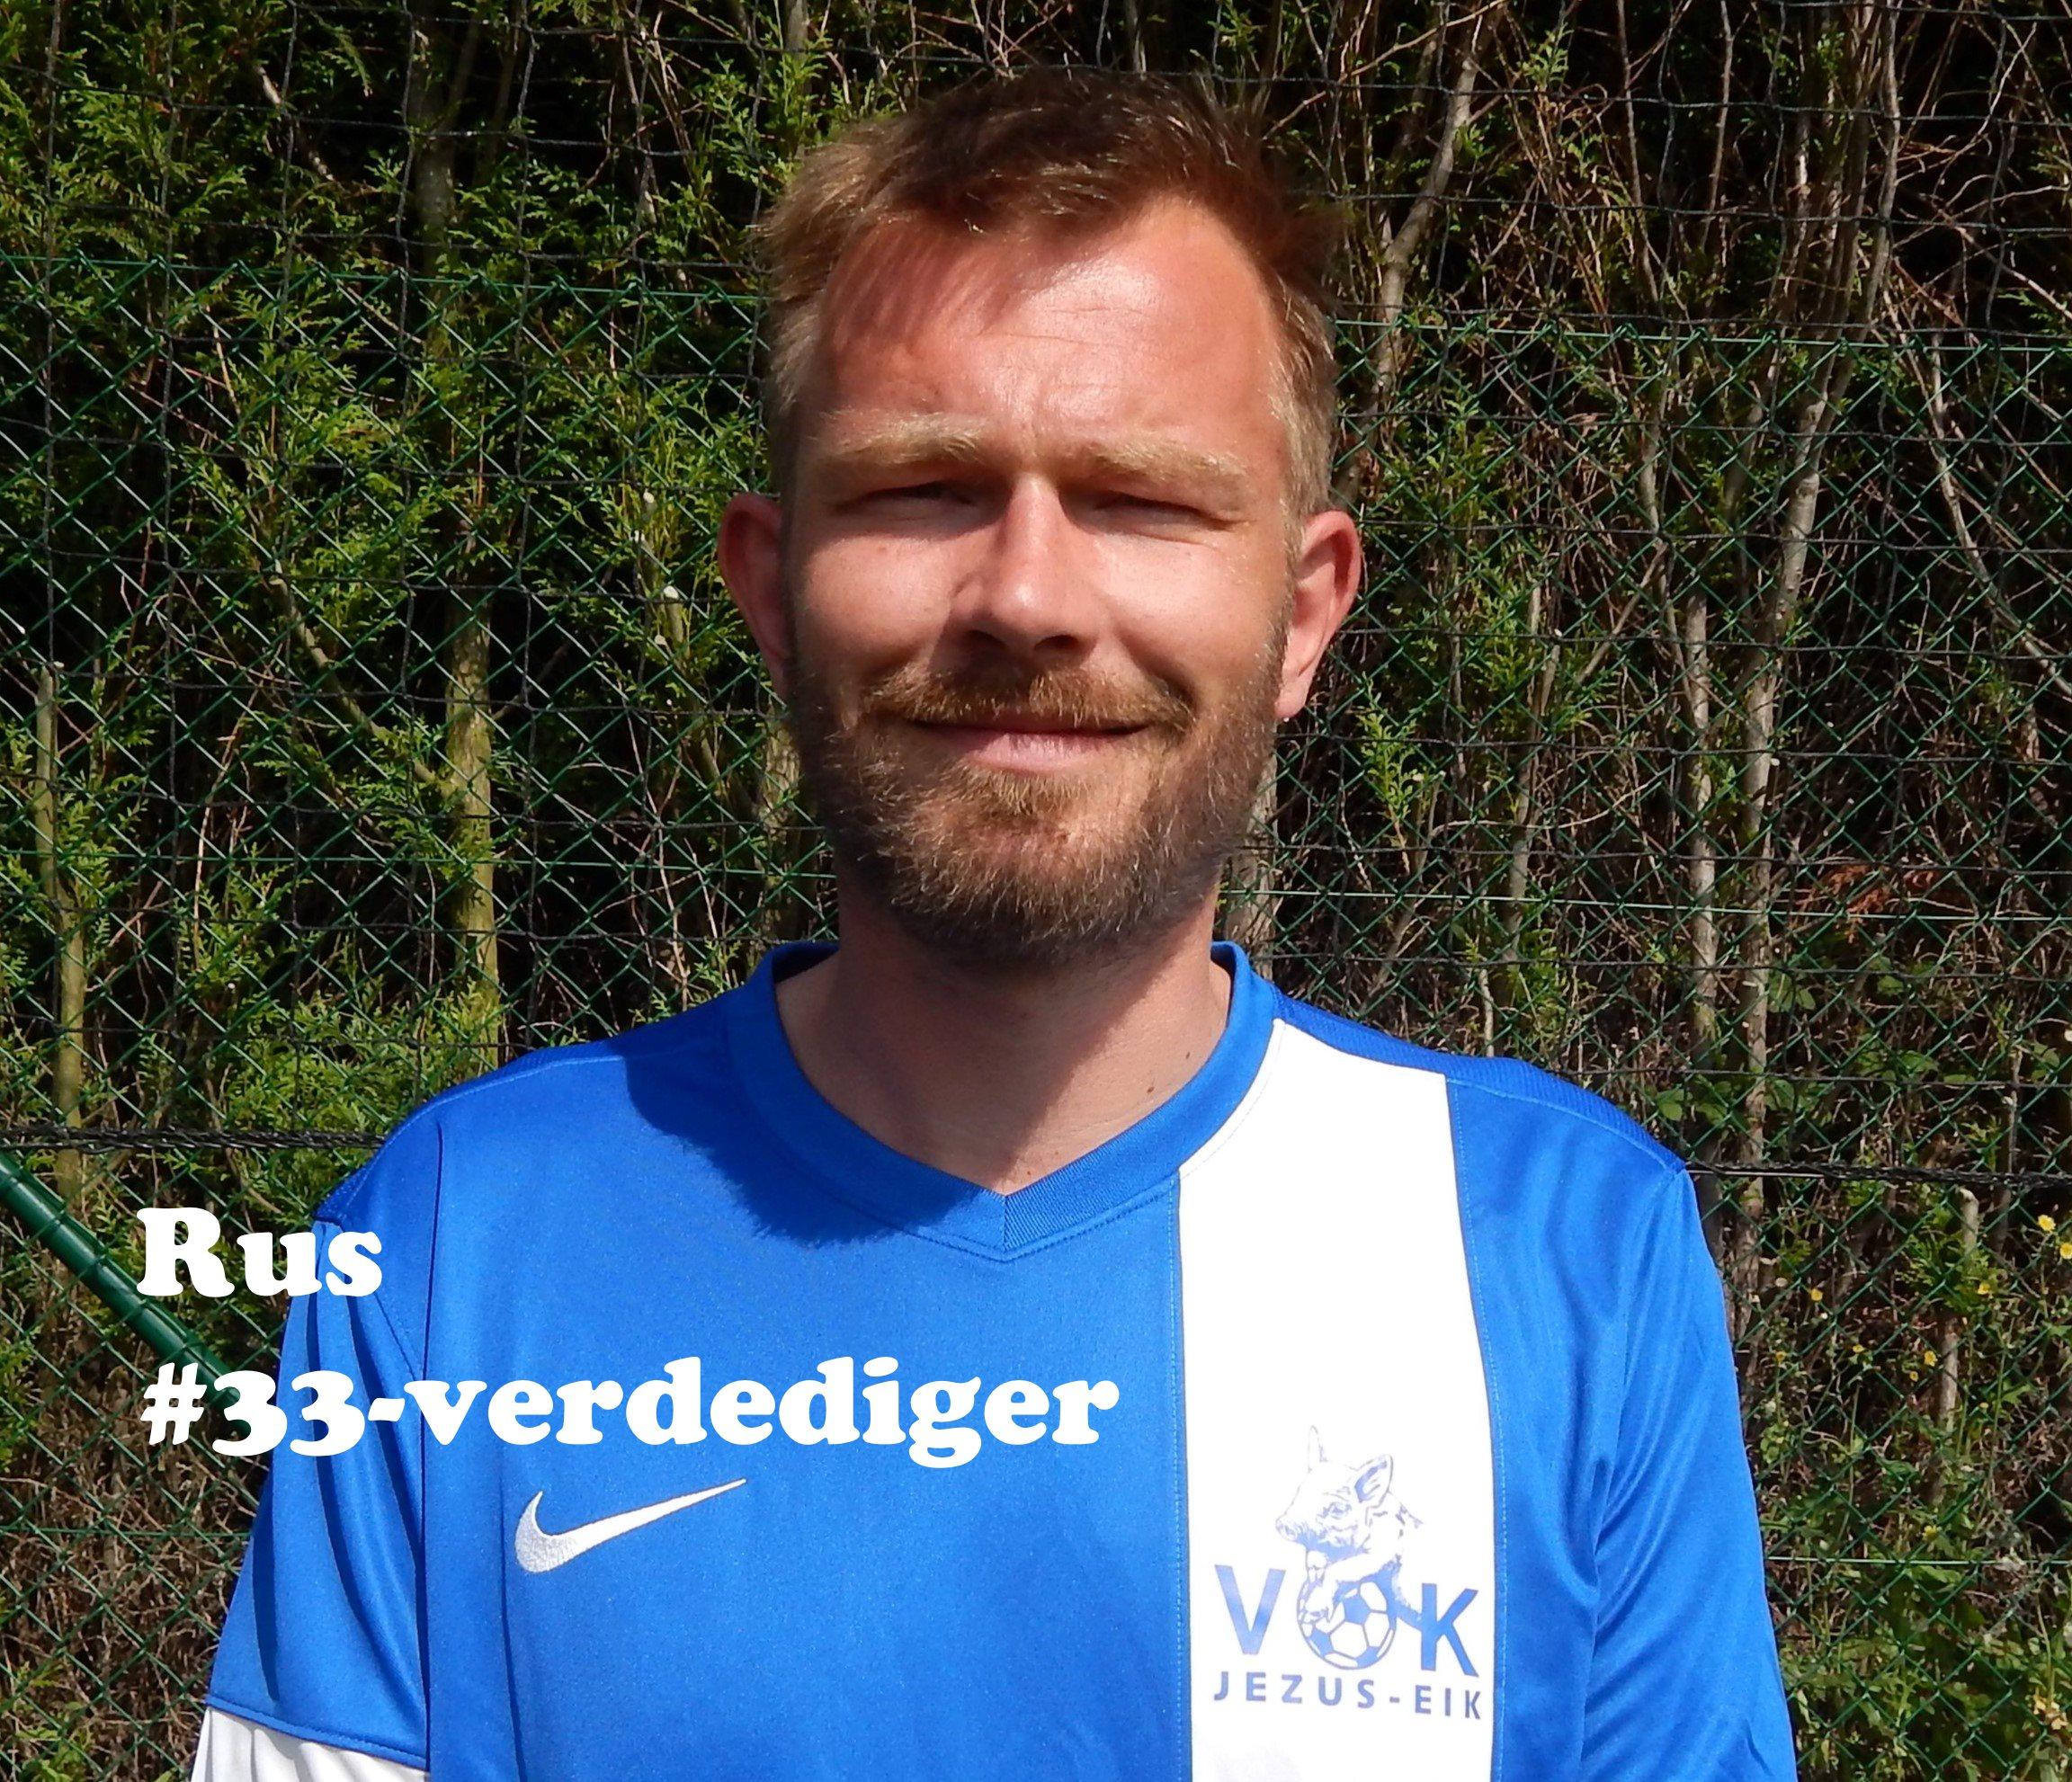 Rus - Verdediger - 33